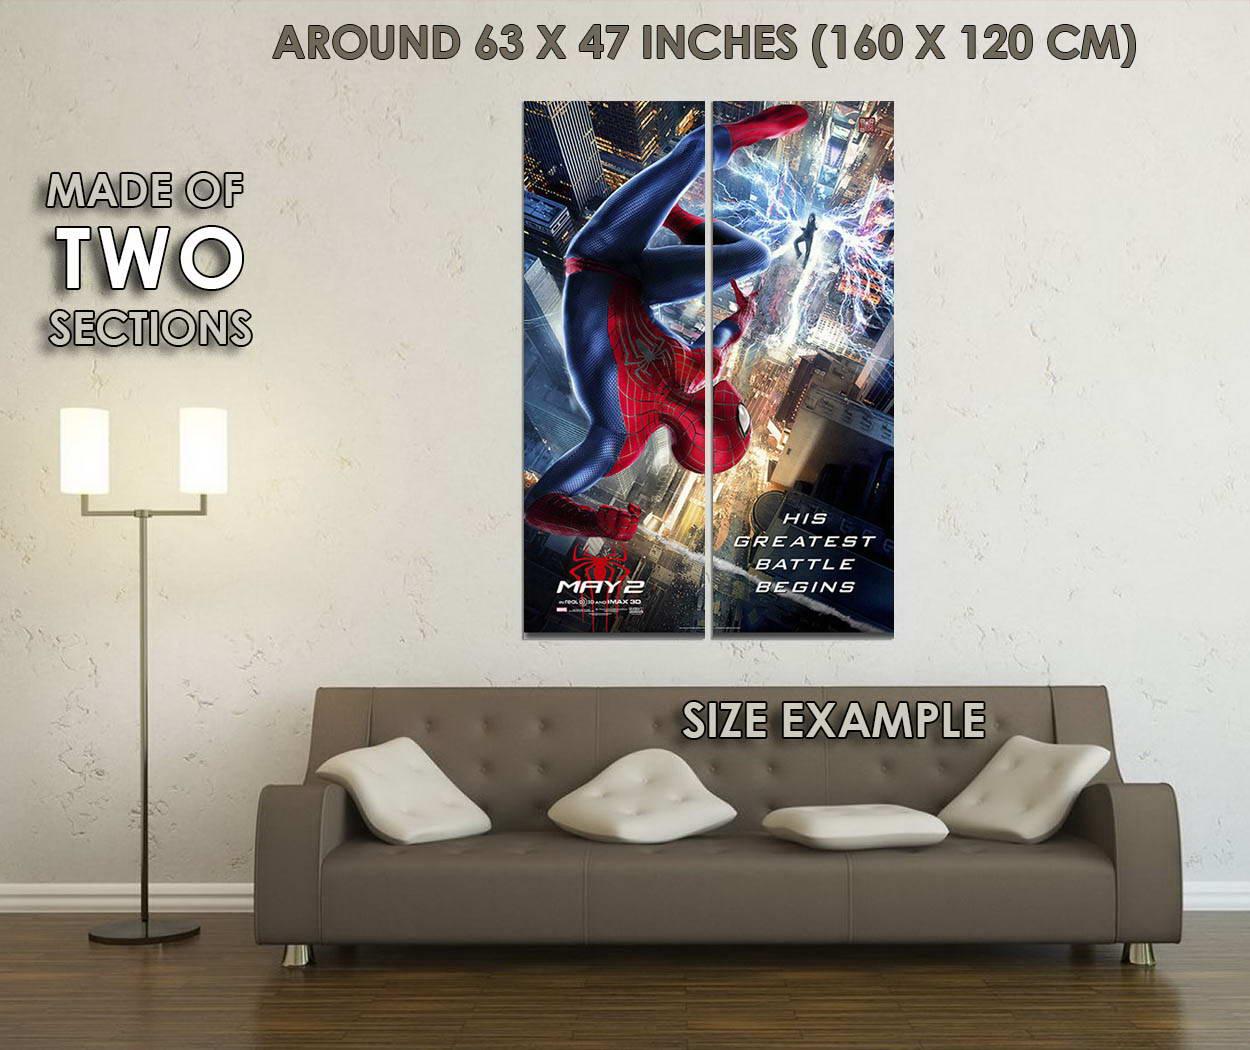 10658-The-Amazing-Spider-Man-Movie-Art-LAMINATED-POSTER-CA thumbnail 6